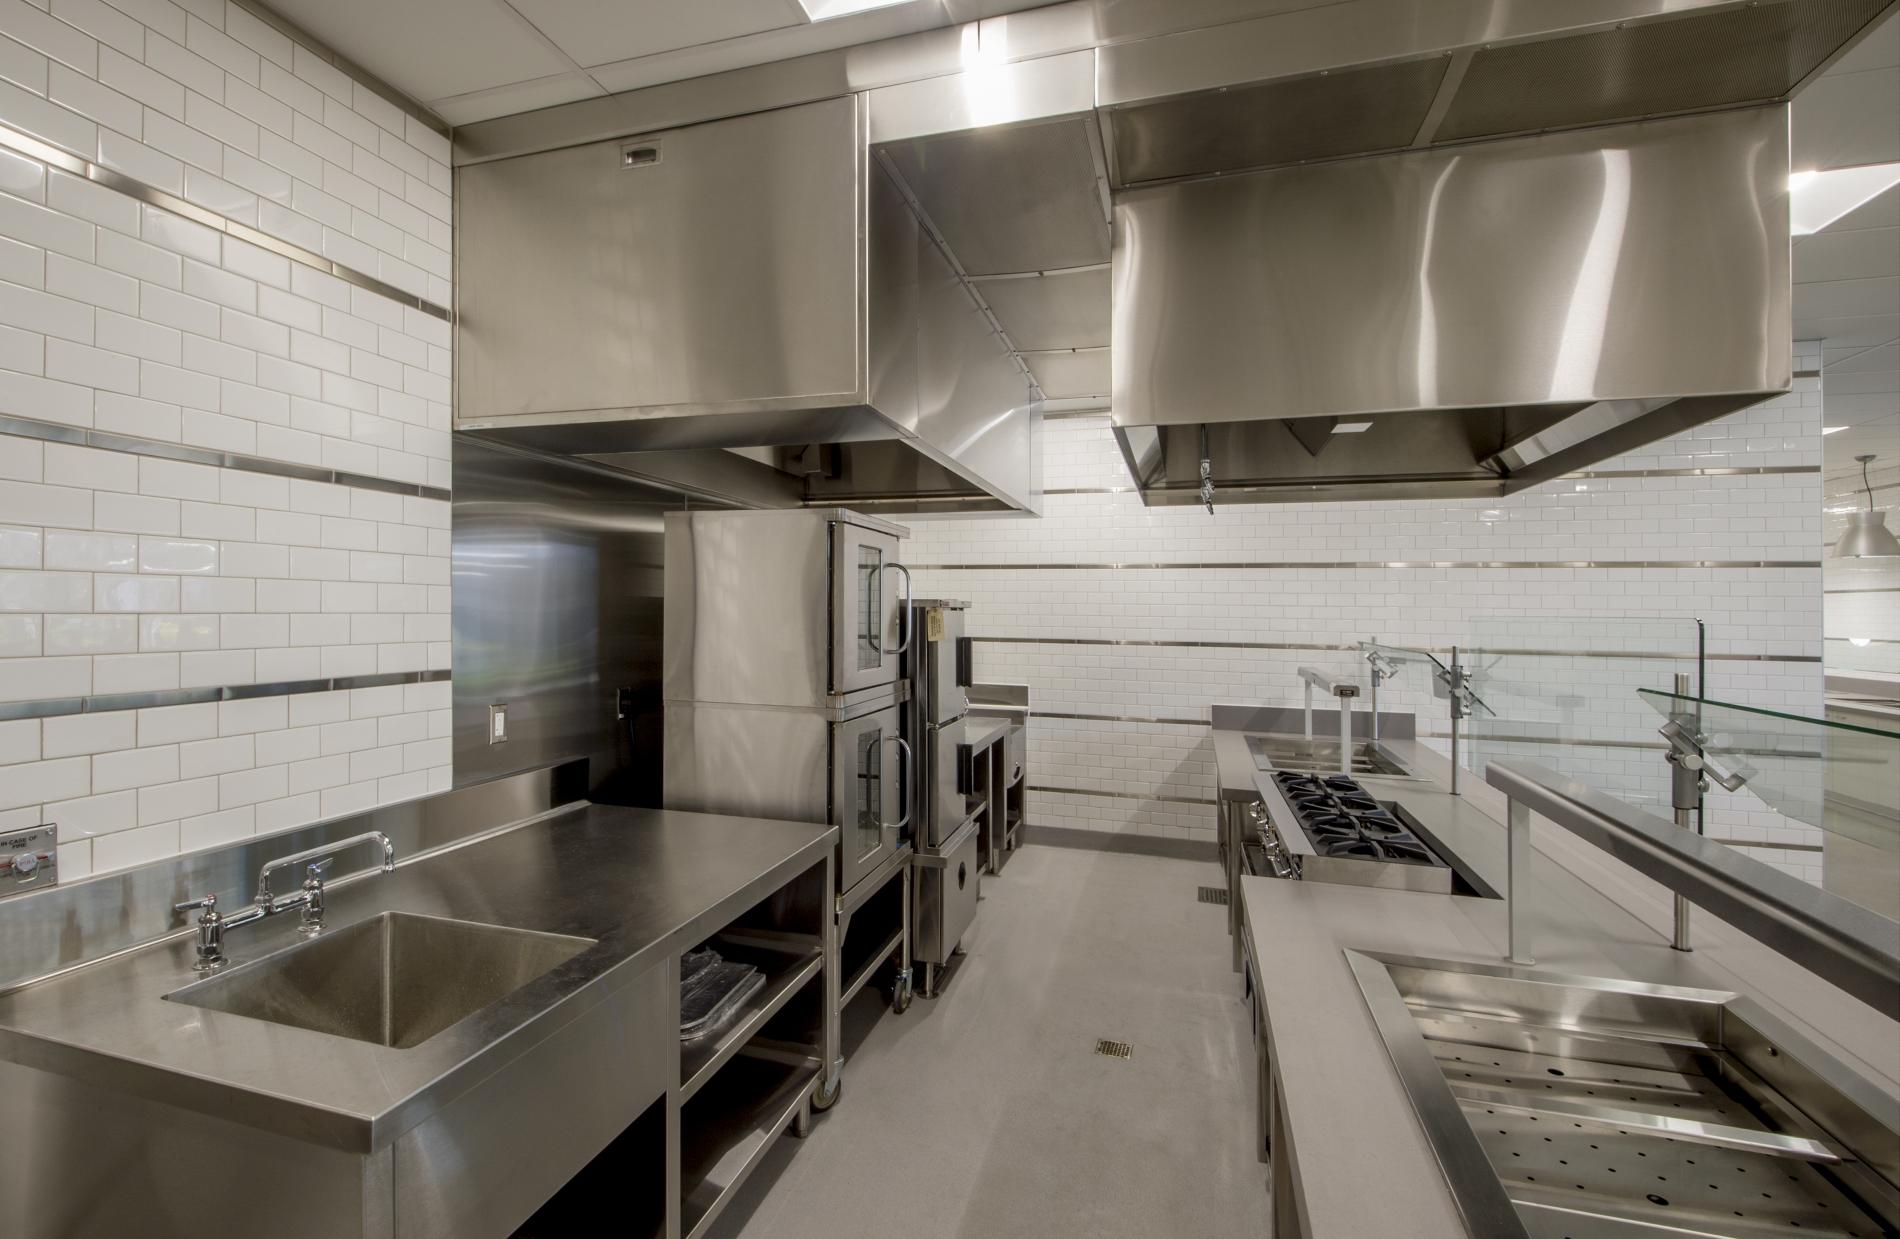 Cappe cucina a vista